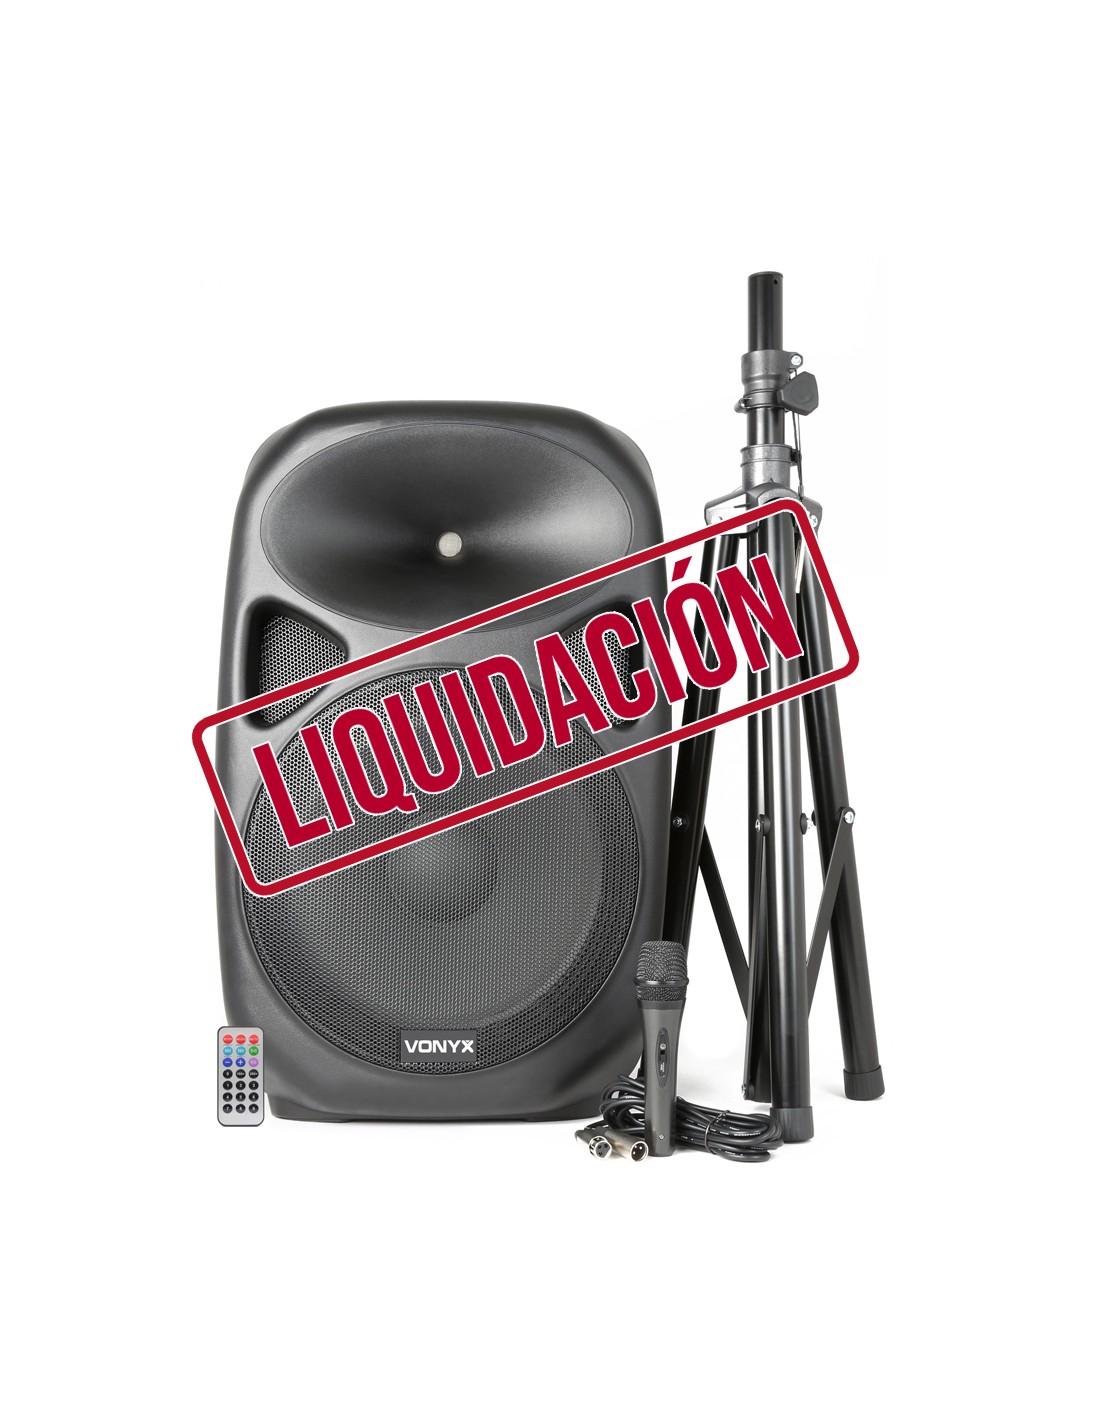 Altavoz Bluetooth con reproductor MP3 + Trípode + Micro + Mando a distancia